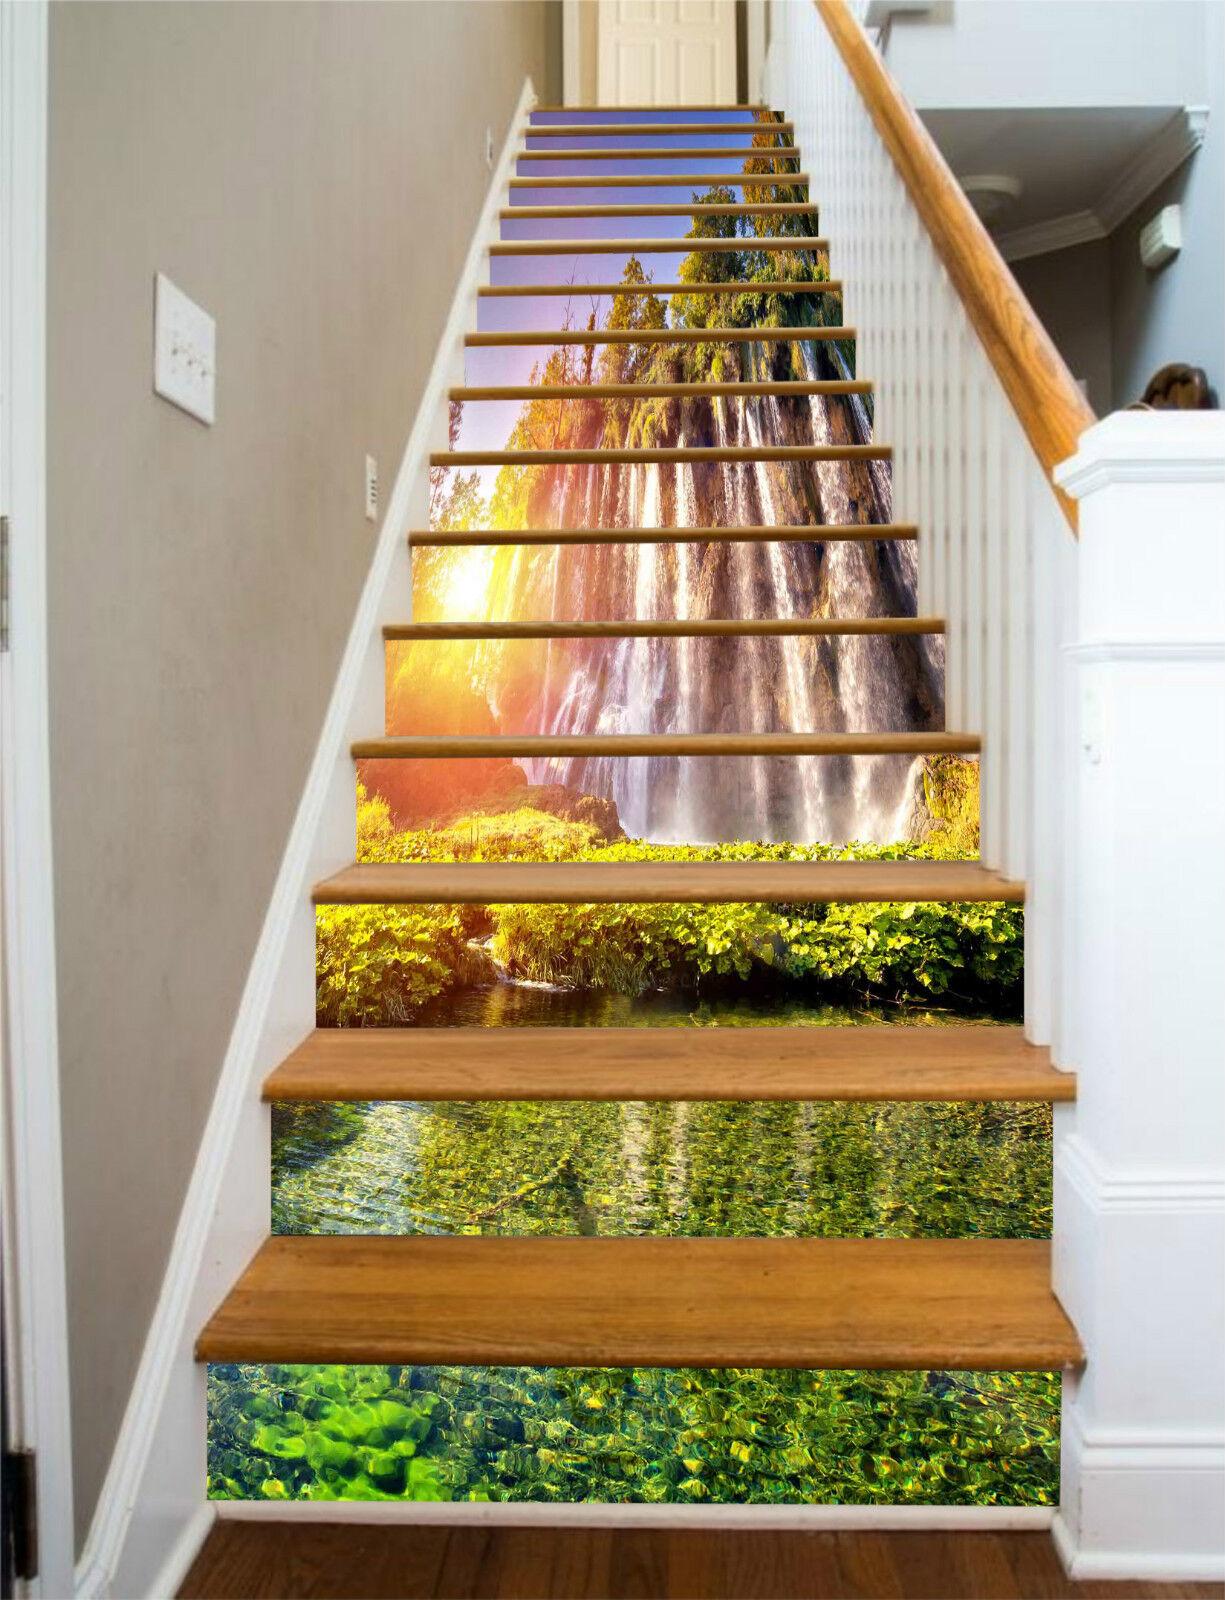 3D Wasserfall Wald 8Stair Risers Dekoration Fototapete Vinyl Aufkleber Tapete DE